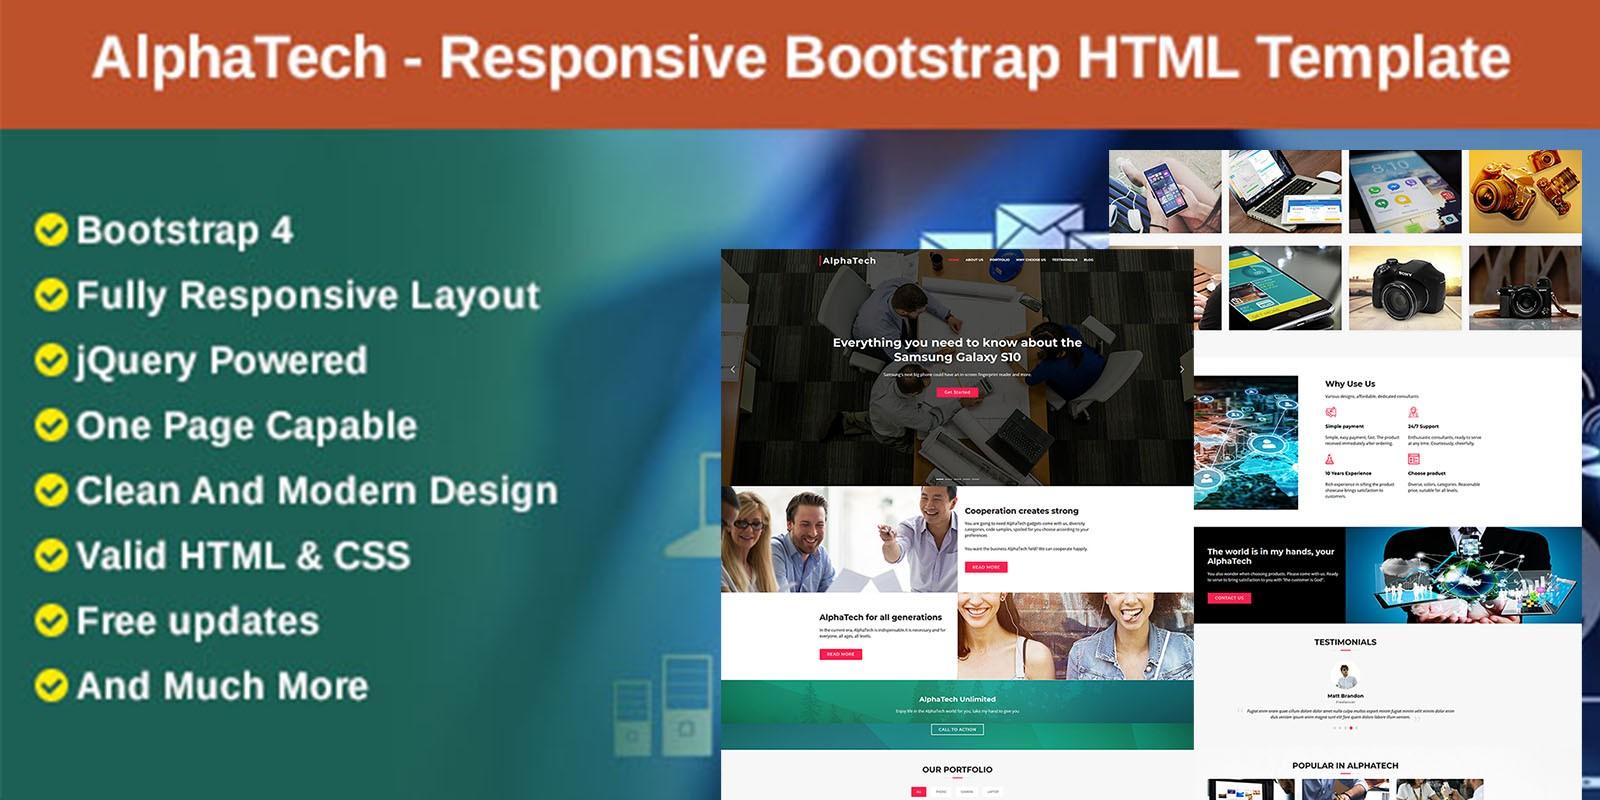 AlphaTech - Responsive Bootstrap HTML Template